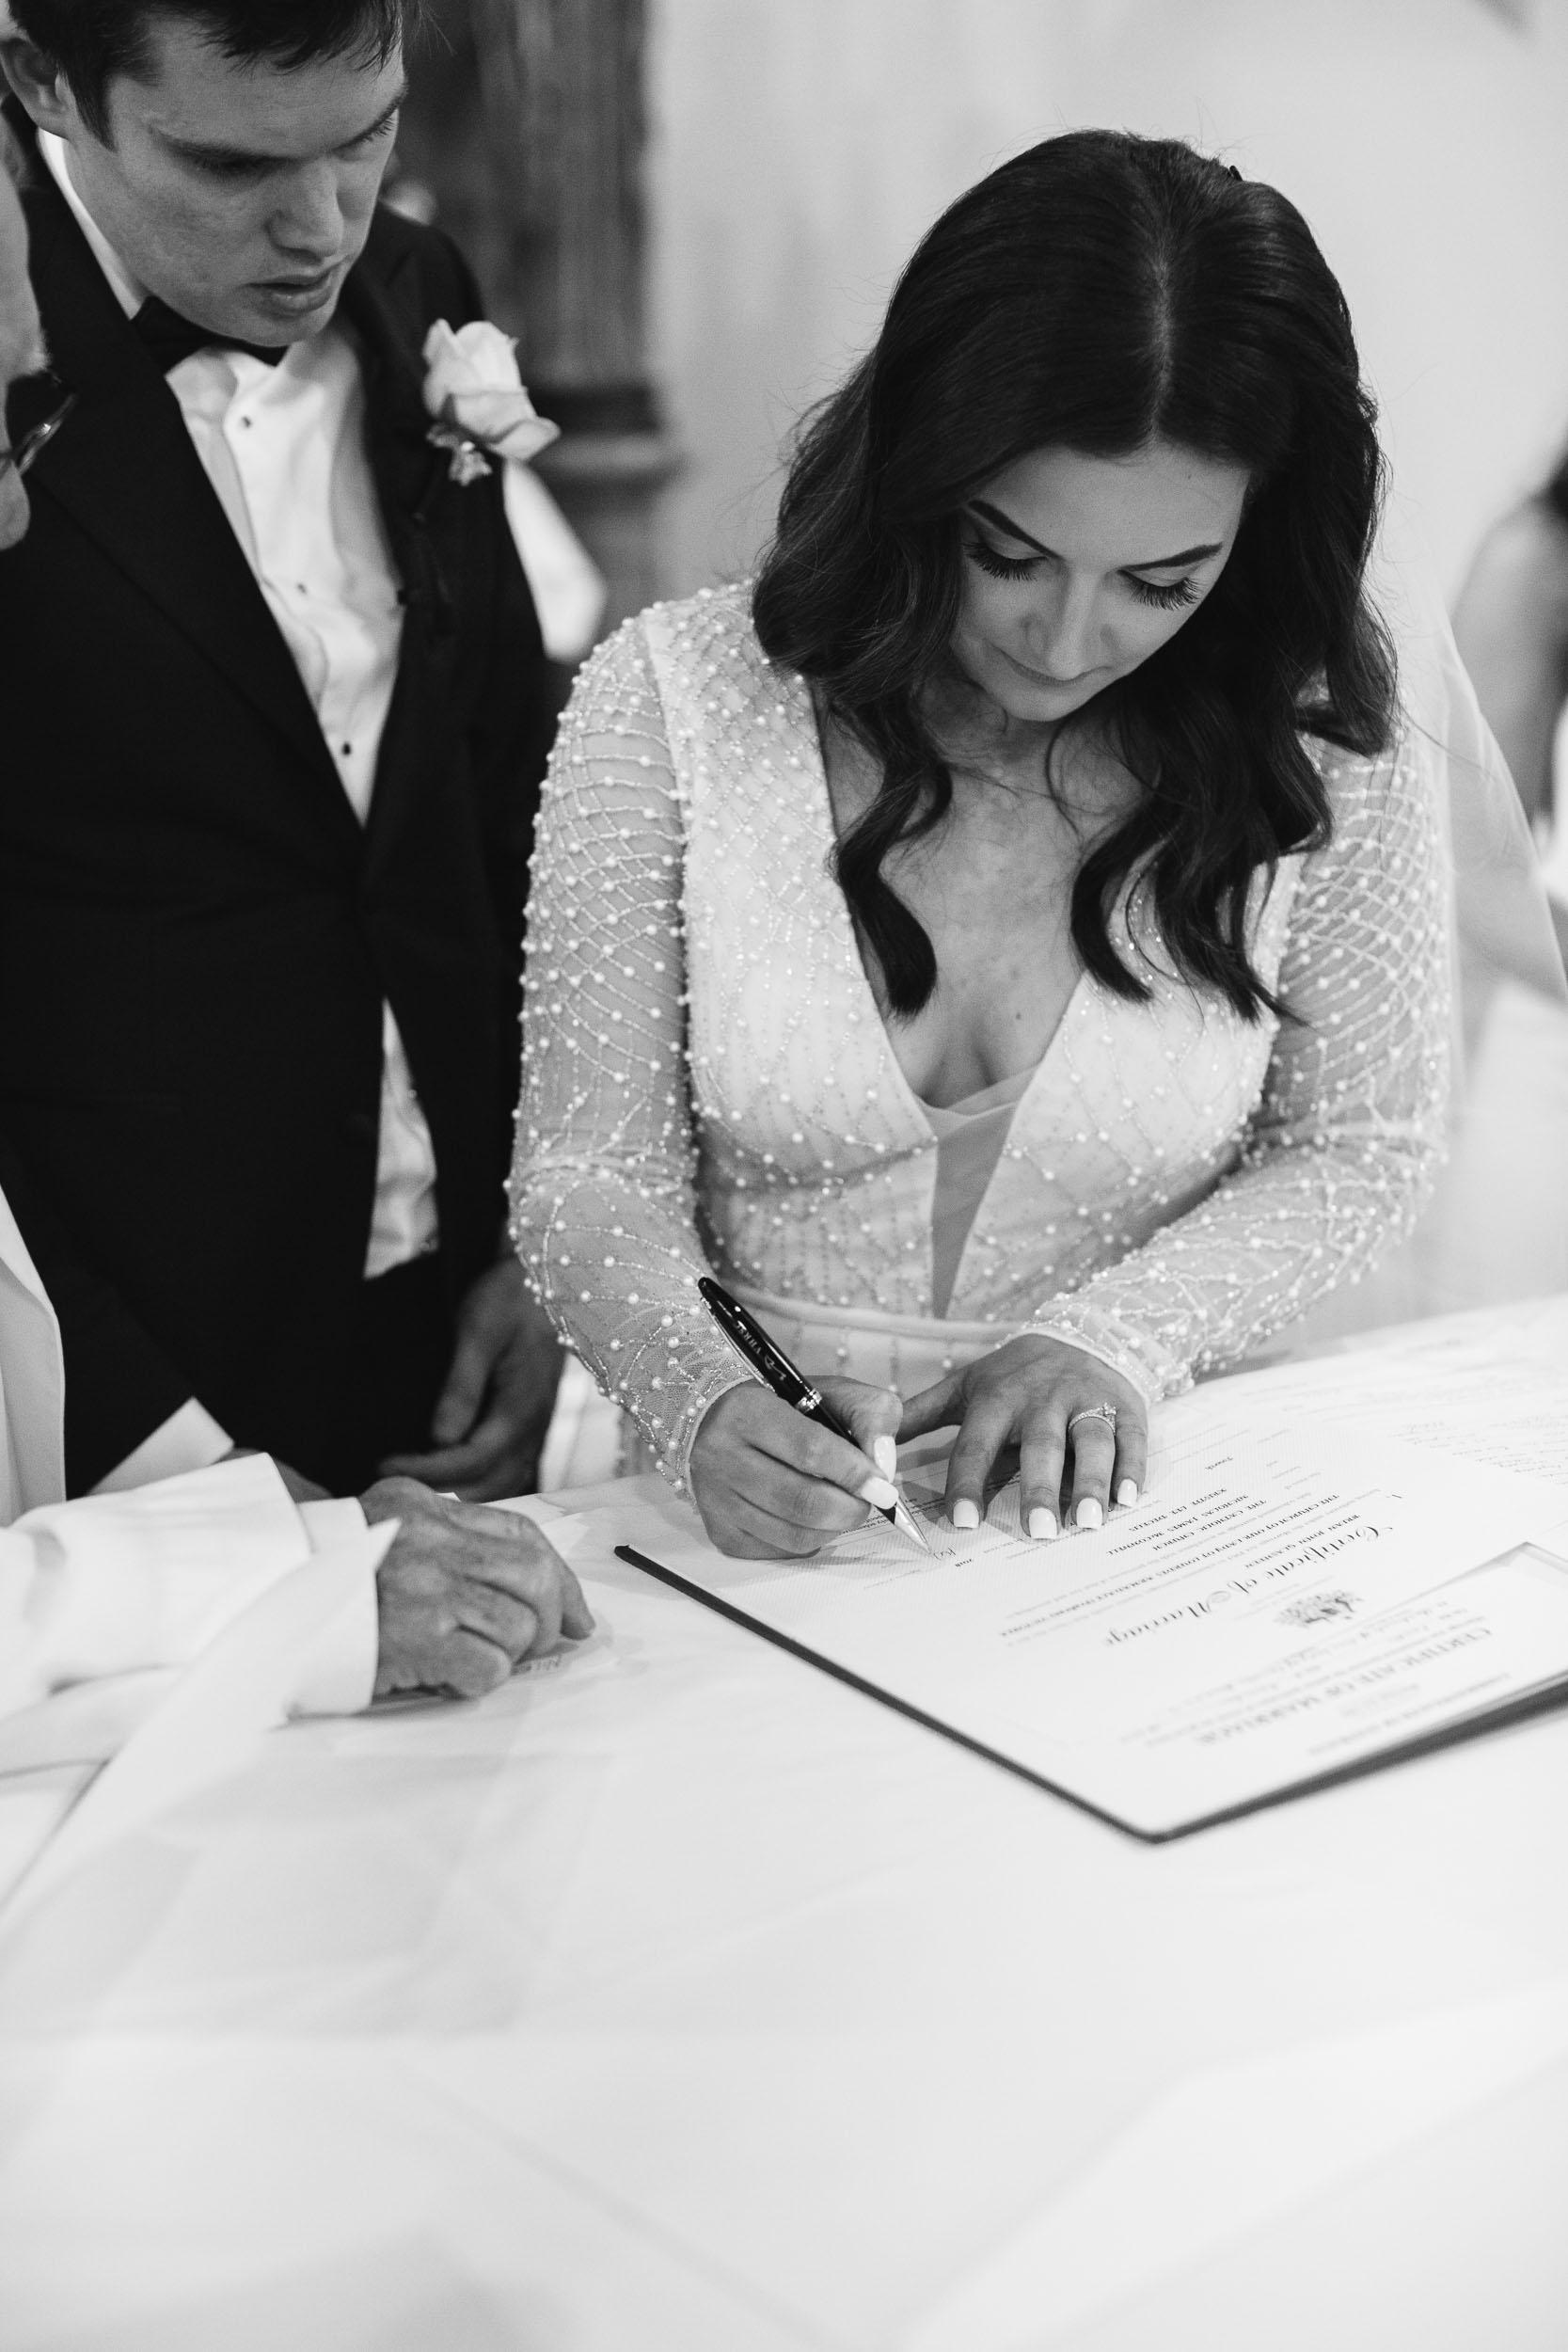 Kas-Richards-Wedding-Photographer-Melbourne-City-Wedding-Alto-Event-Space-Jane-Hill-Bridal-Gown-33.jpg